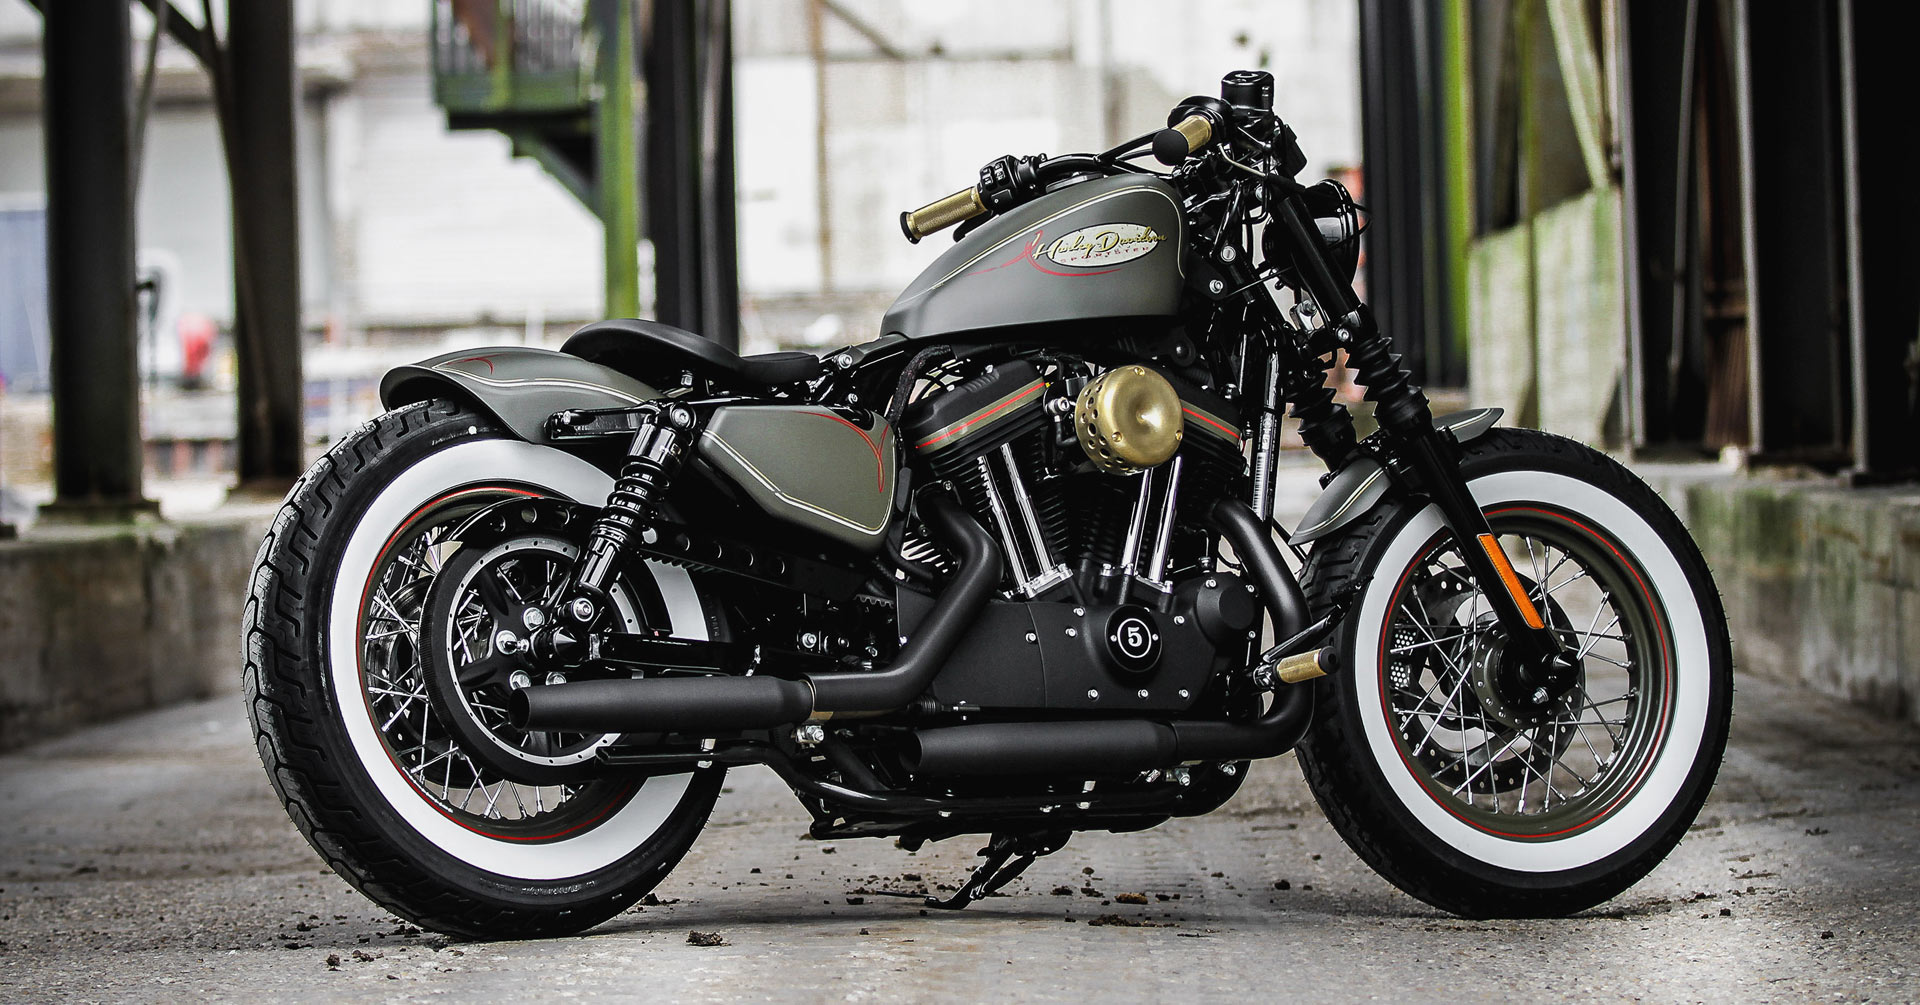 Harley 48 Bobber Price Off 50 Www Abrafiltros Org Br